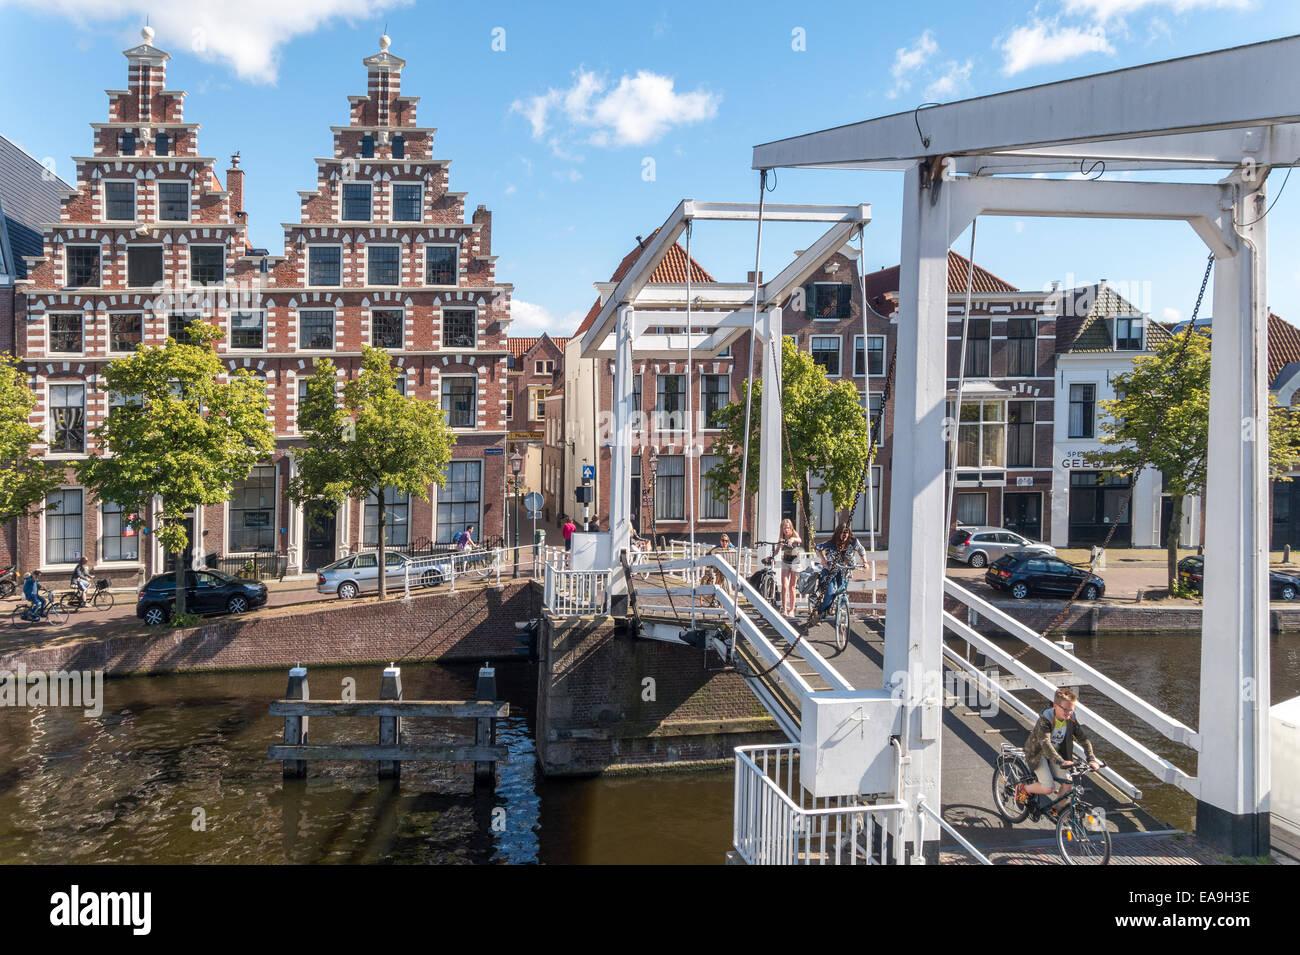 https://c7.alamy.com/comp/EA9H3E/haarlem-wooden-drawbridge-for-bicycles-bikes-cycles-gravestenen-bridge-EA9H3E.jpg